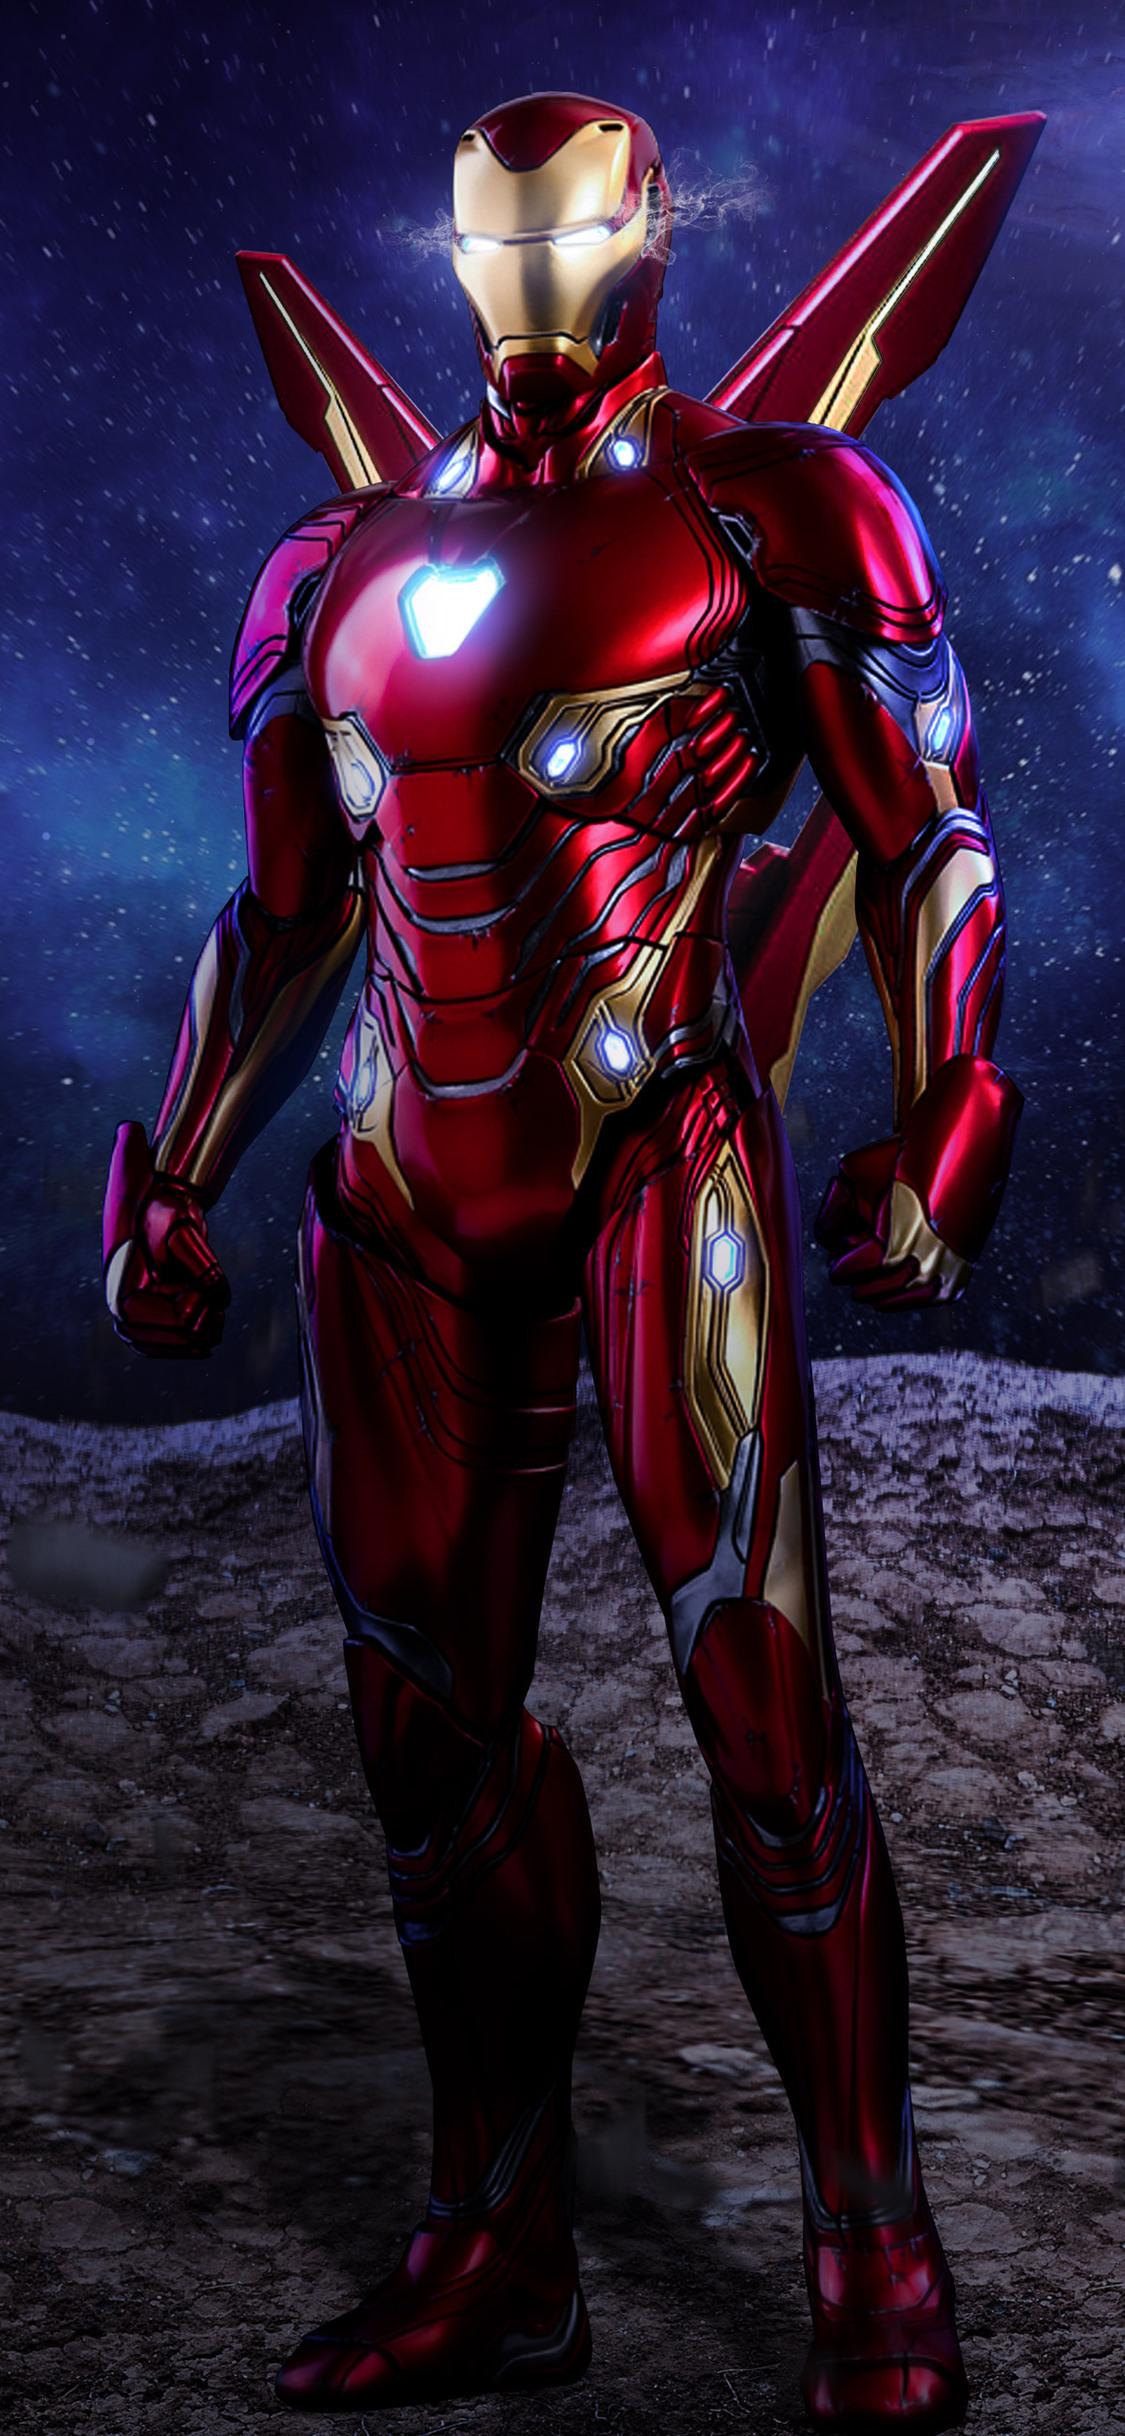 iron-man-avengers-infinity-war-suit-artwork-67.jpg